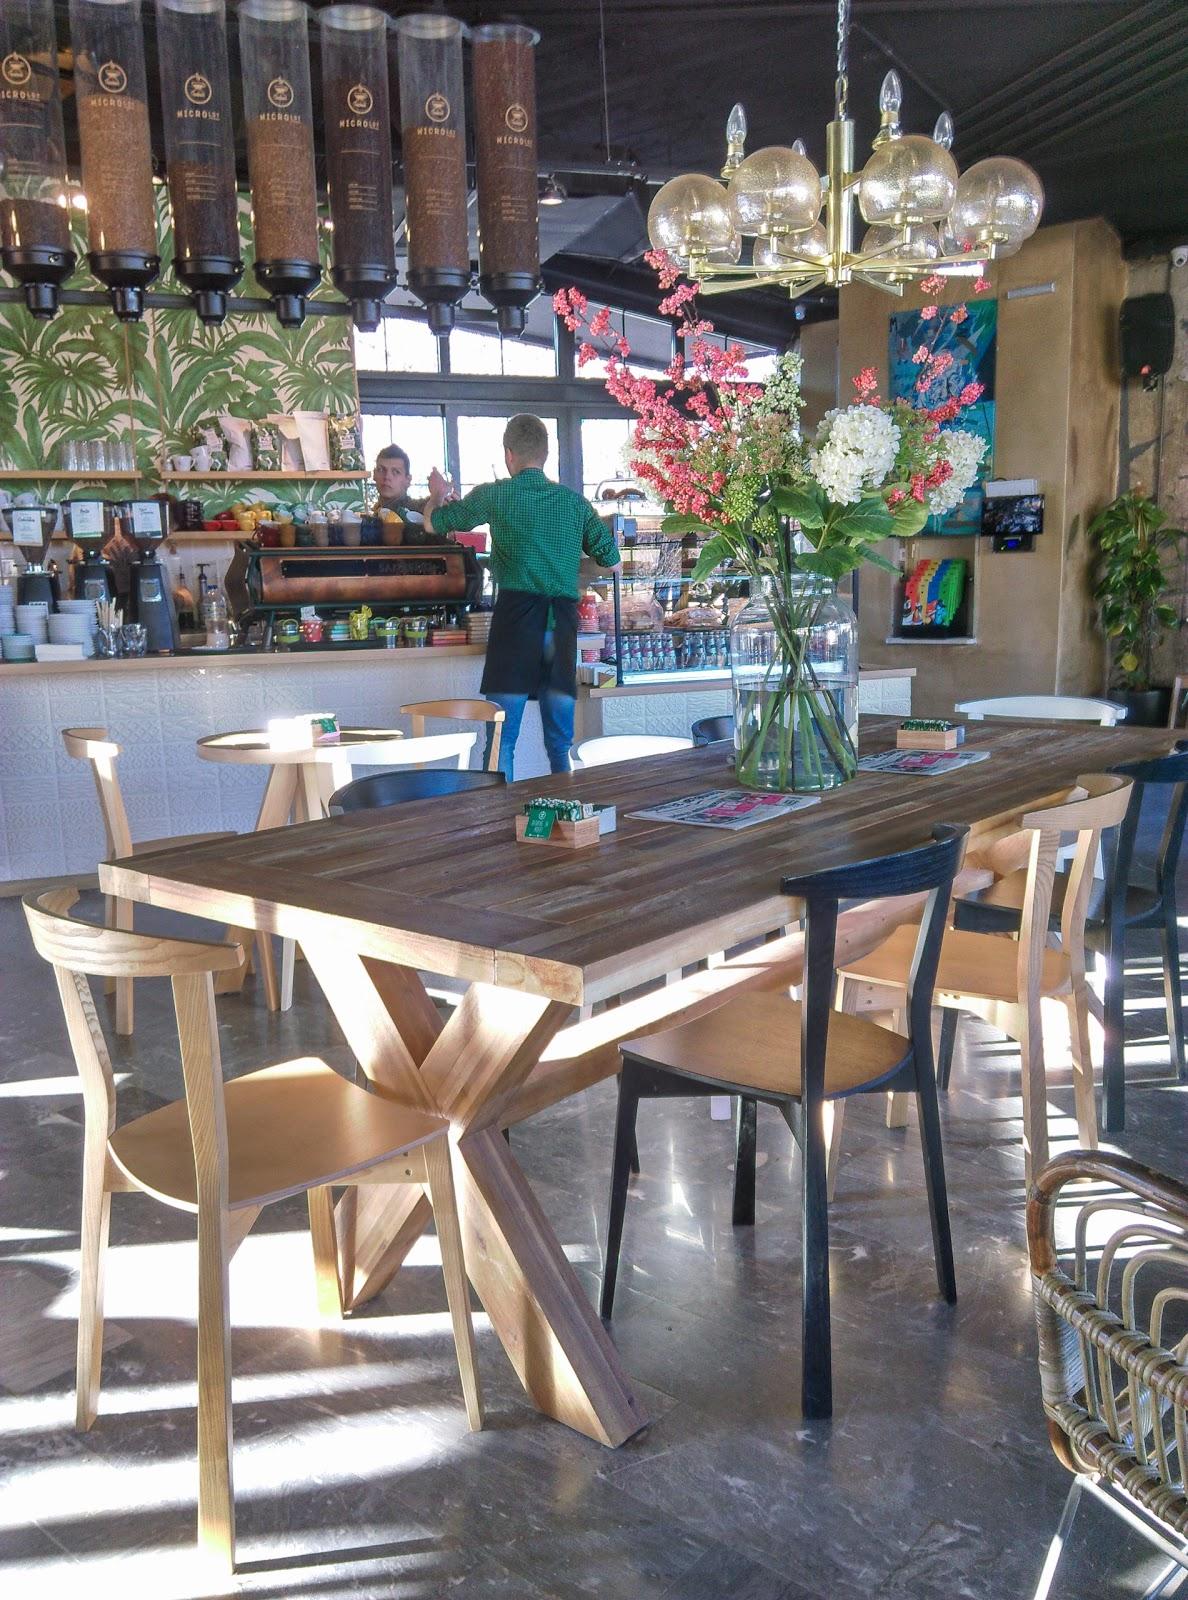 Kafeterija Fontana: A Work-Friendly Place in Belgrade